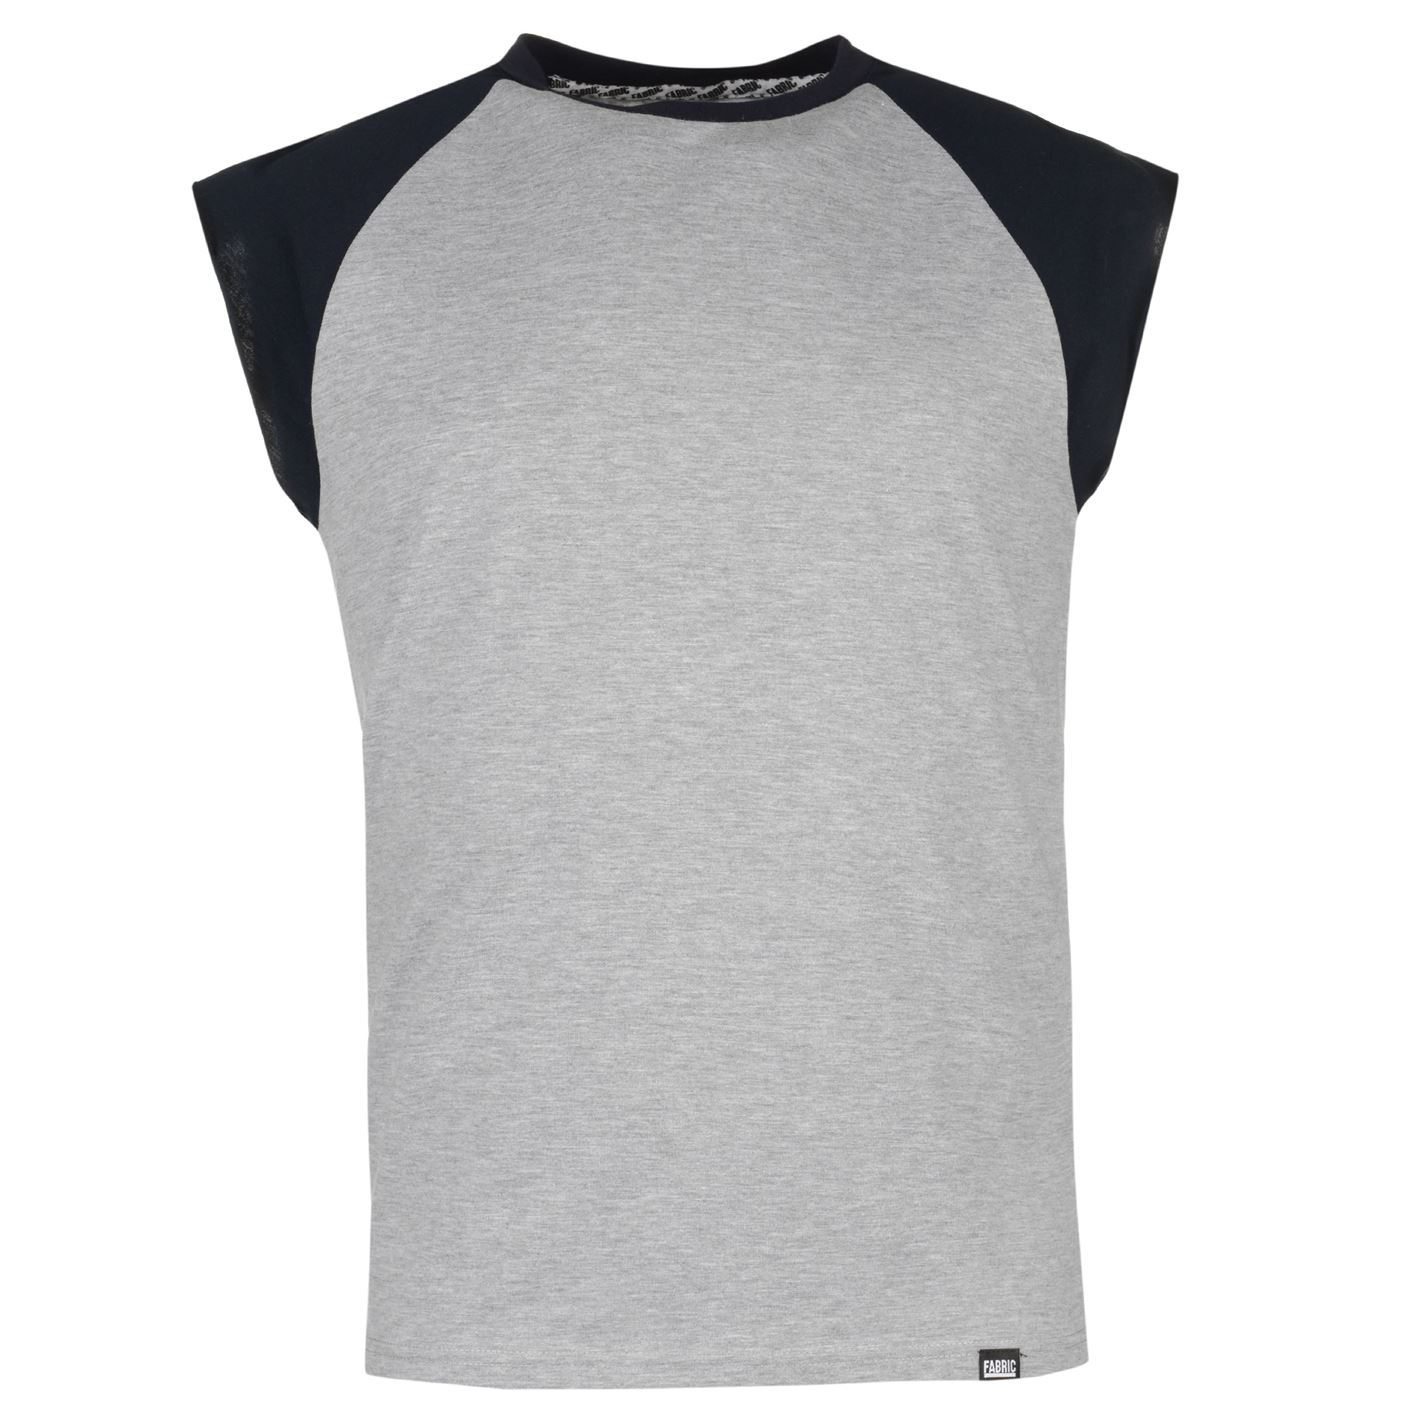 Fabric Mens Raglan Sleeveless T Shirt Cotton Crew Casual